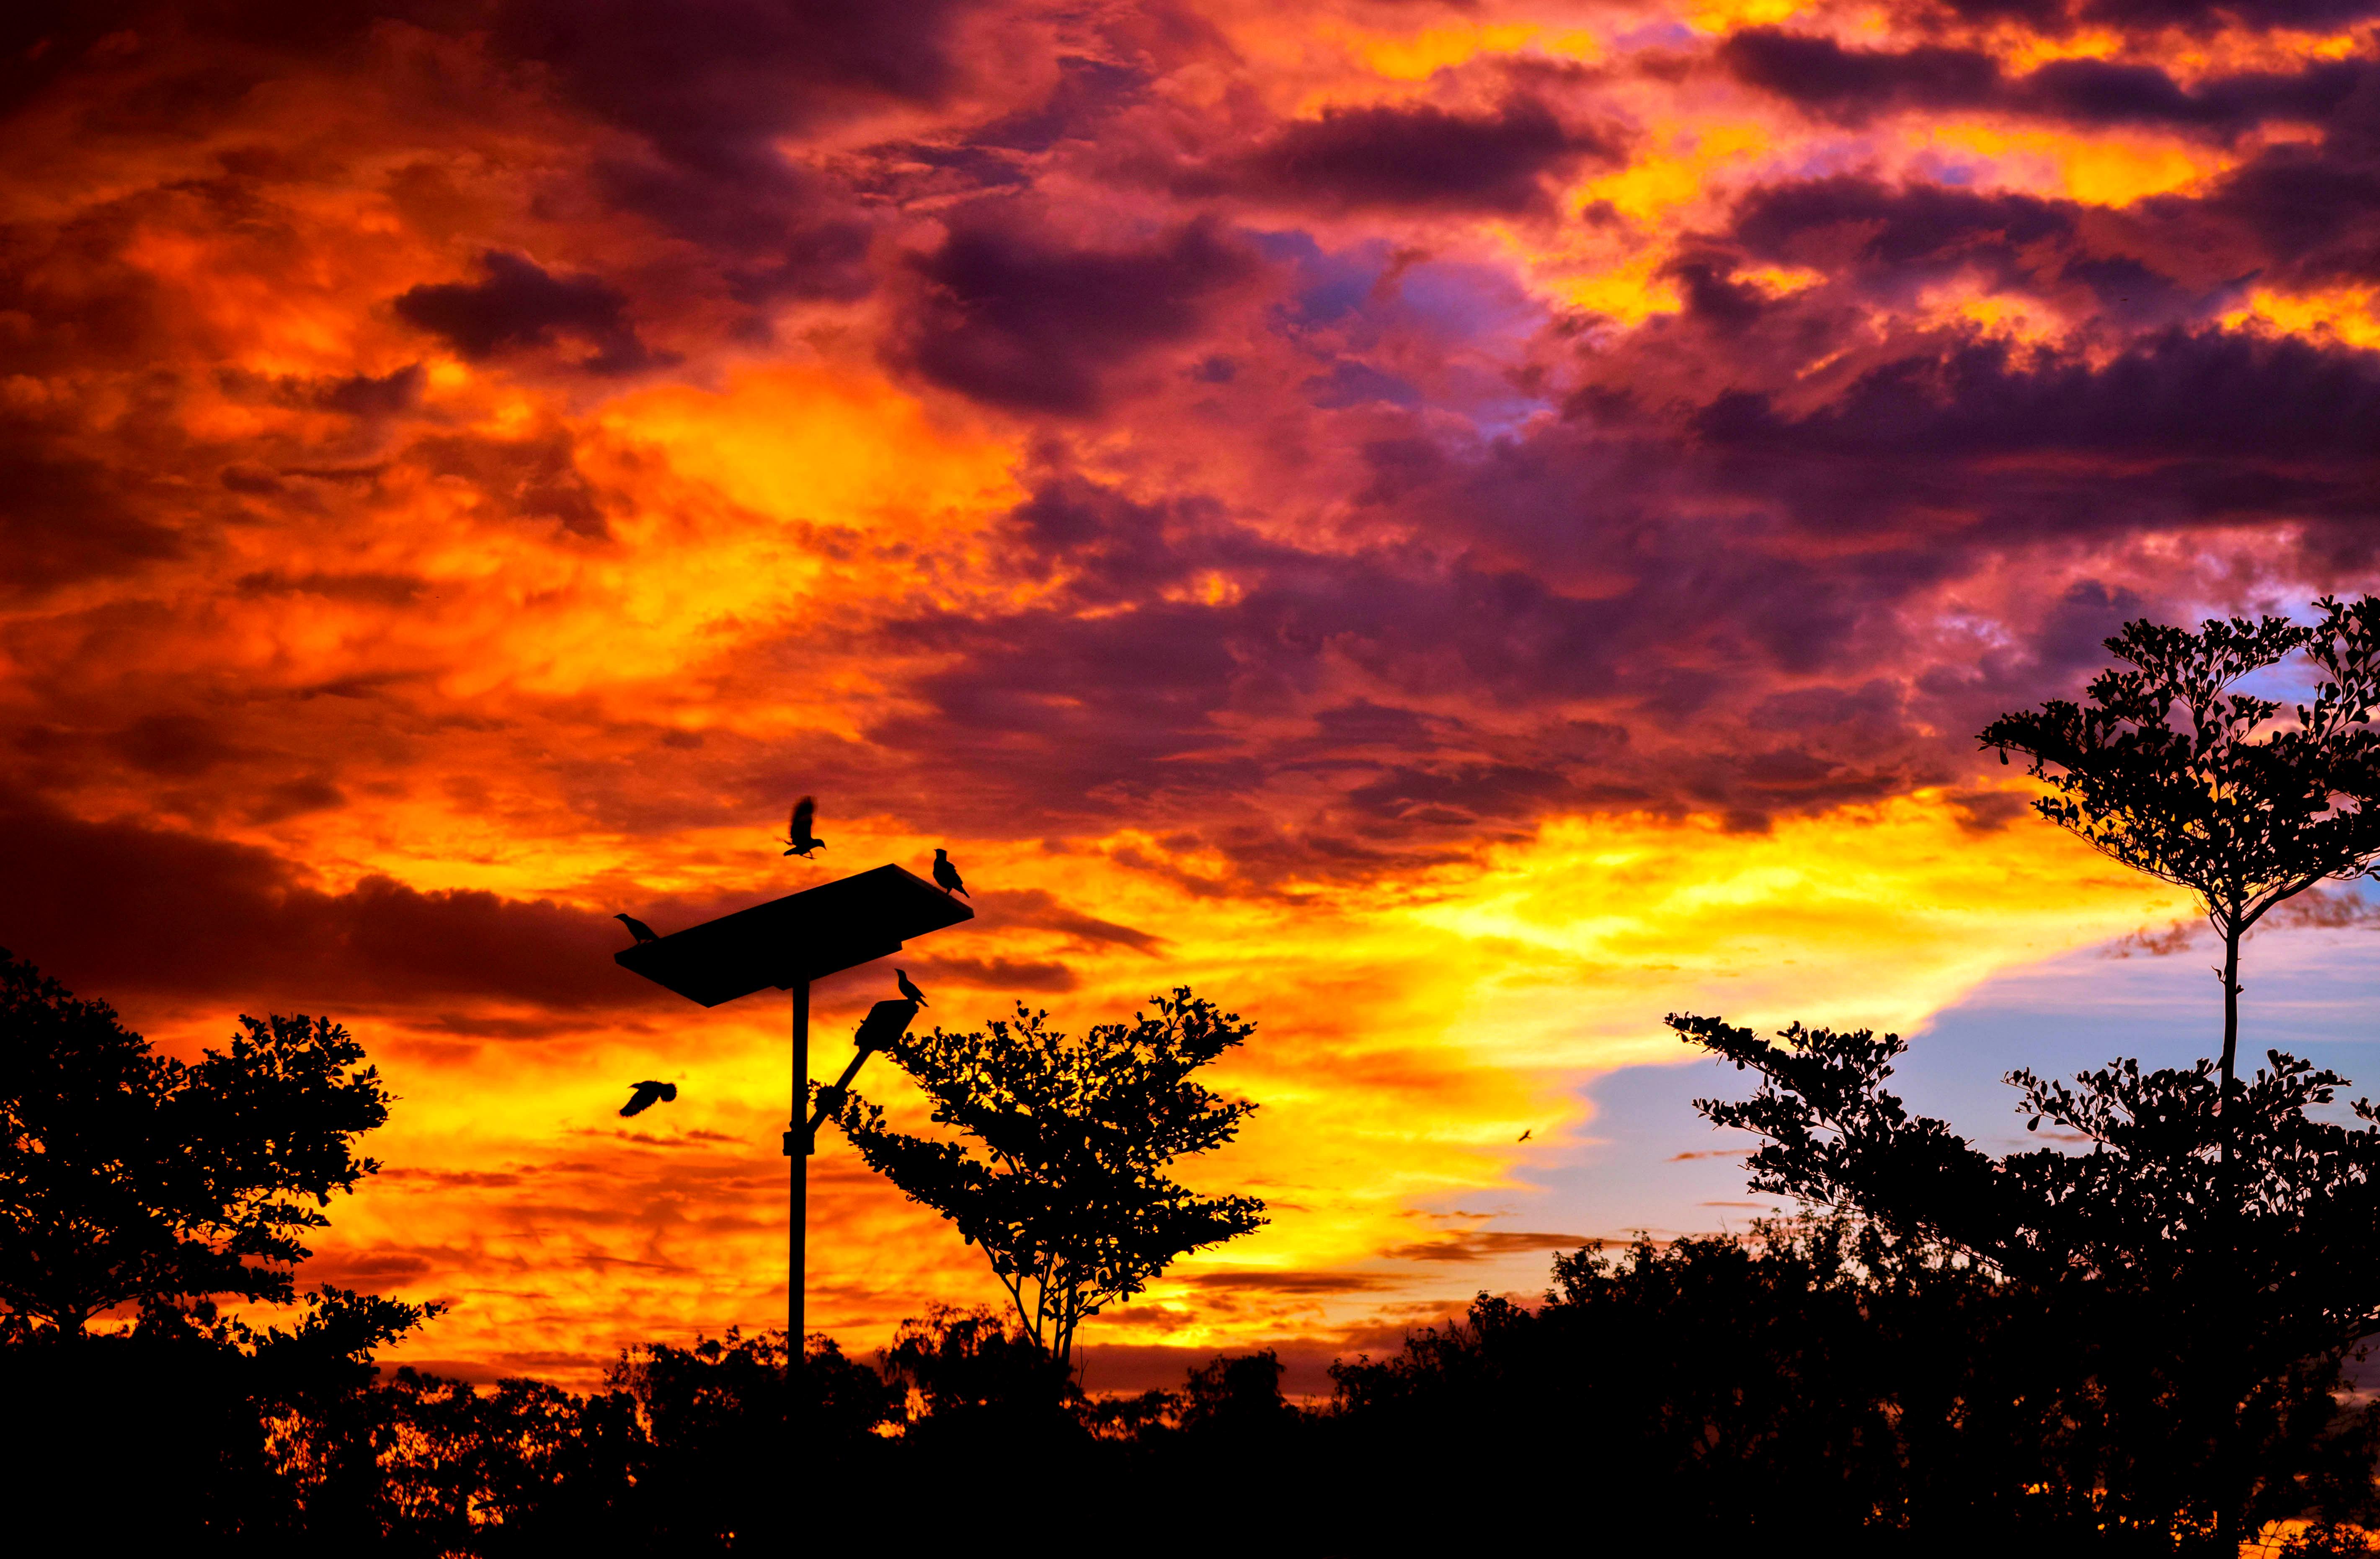 Twilight clouds photo